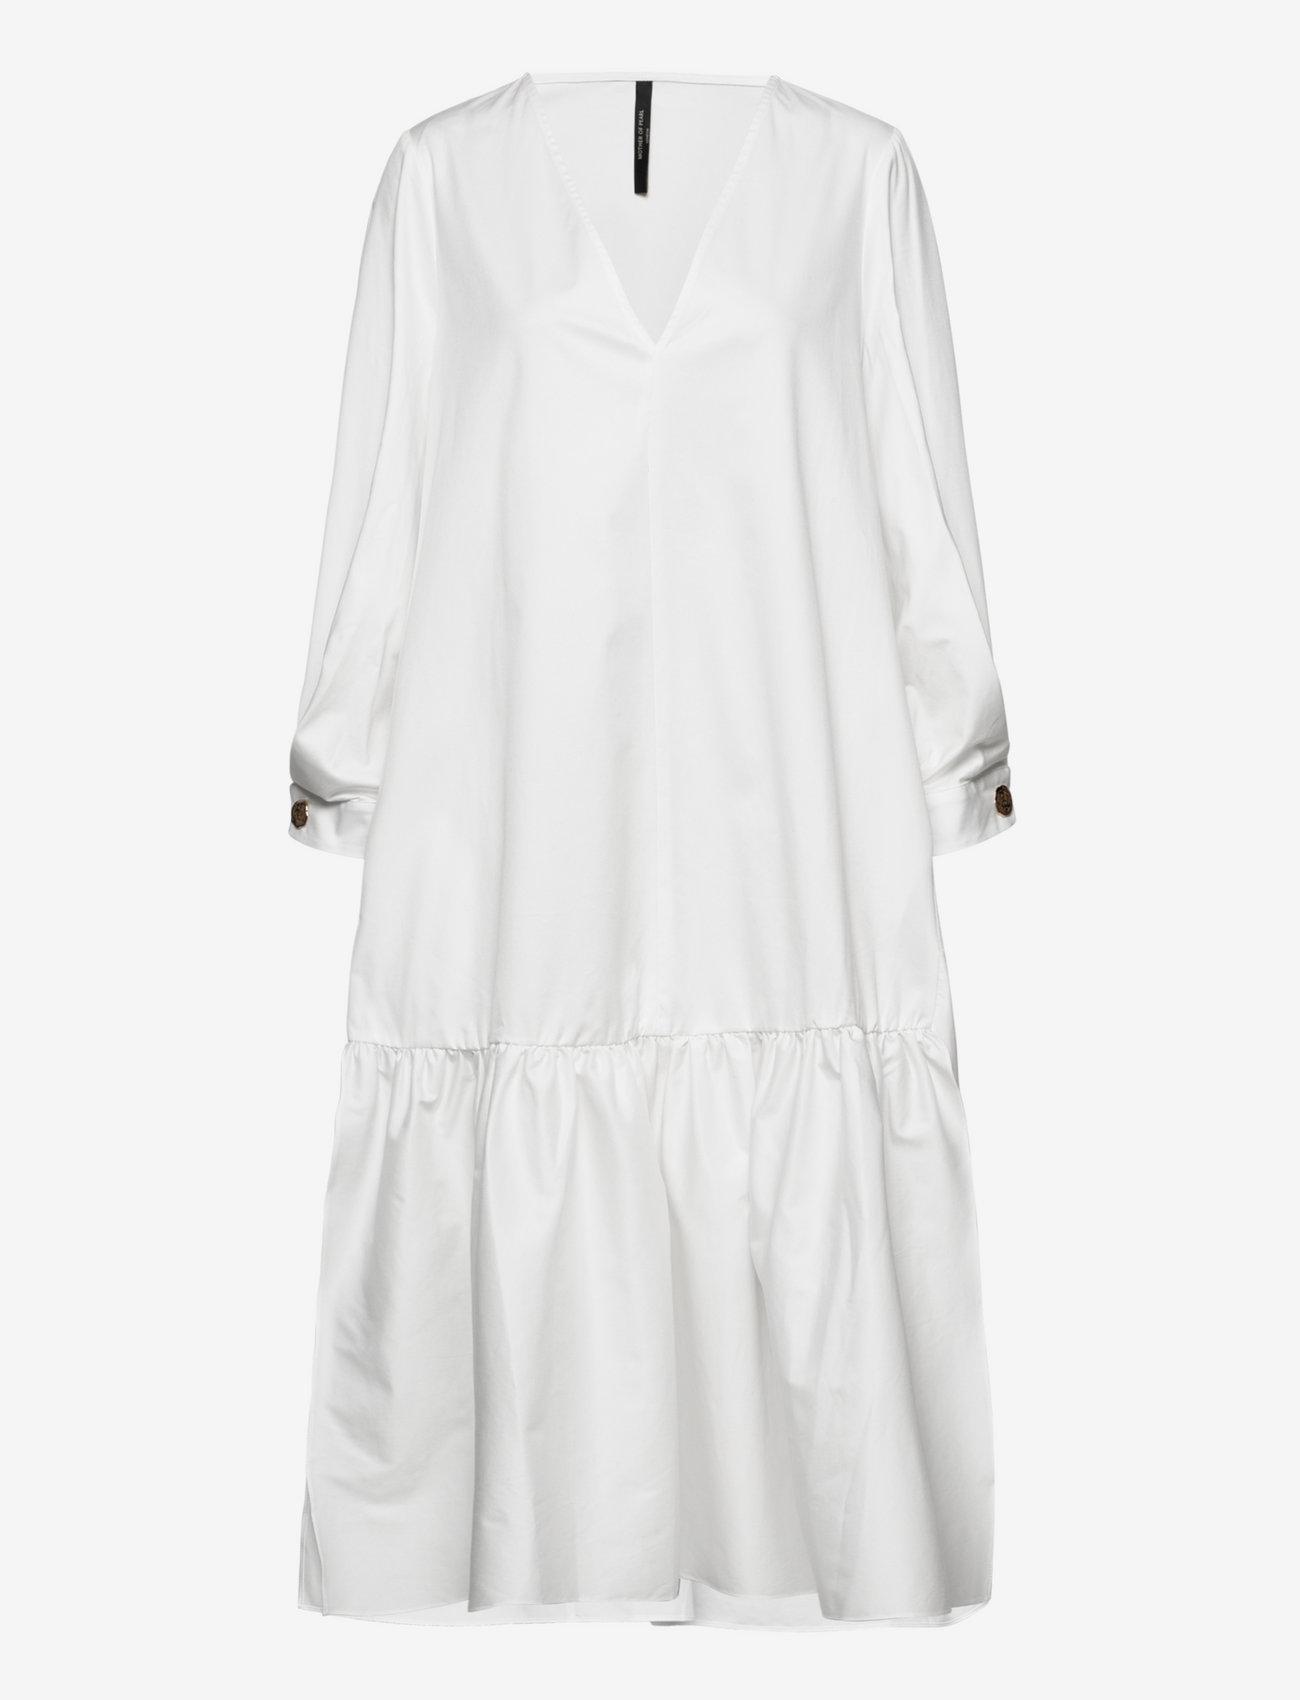 Mother of Pearl - DANICA WHITE DRESS - summer dresses - white - 0